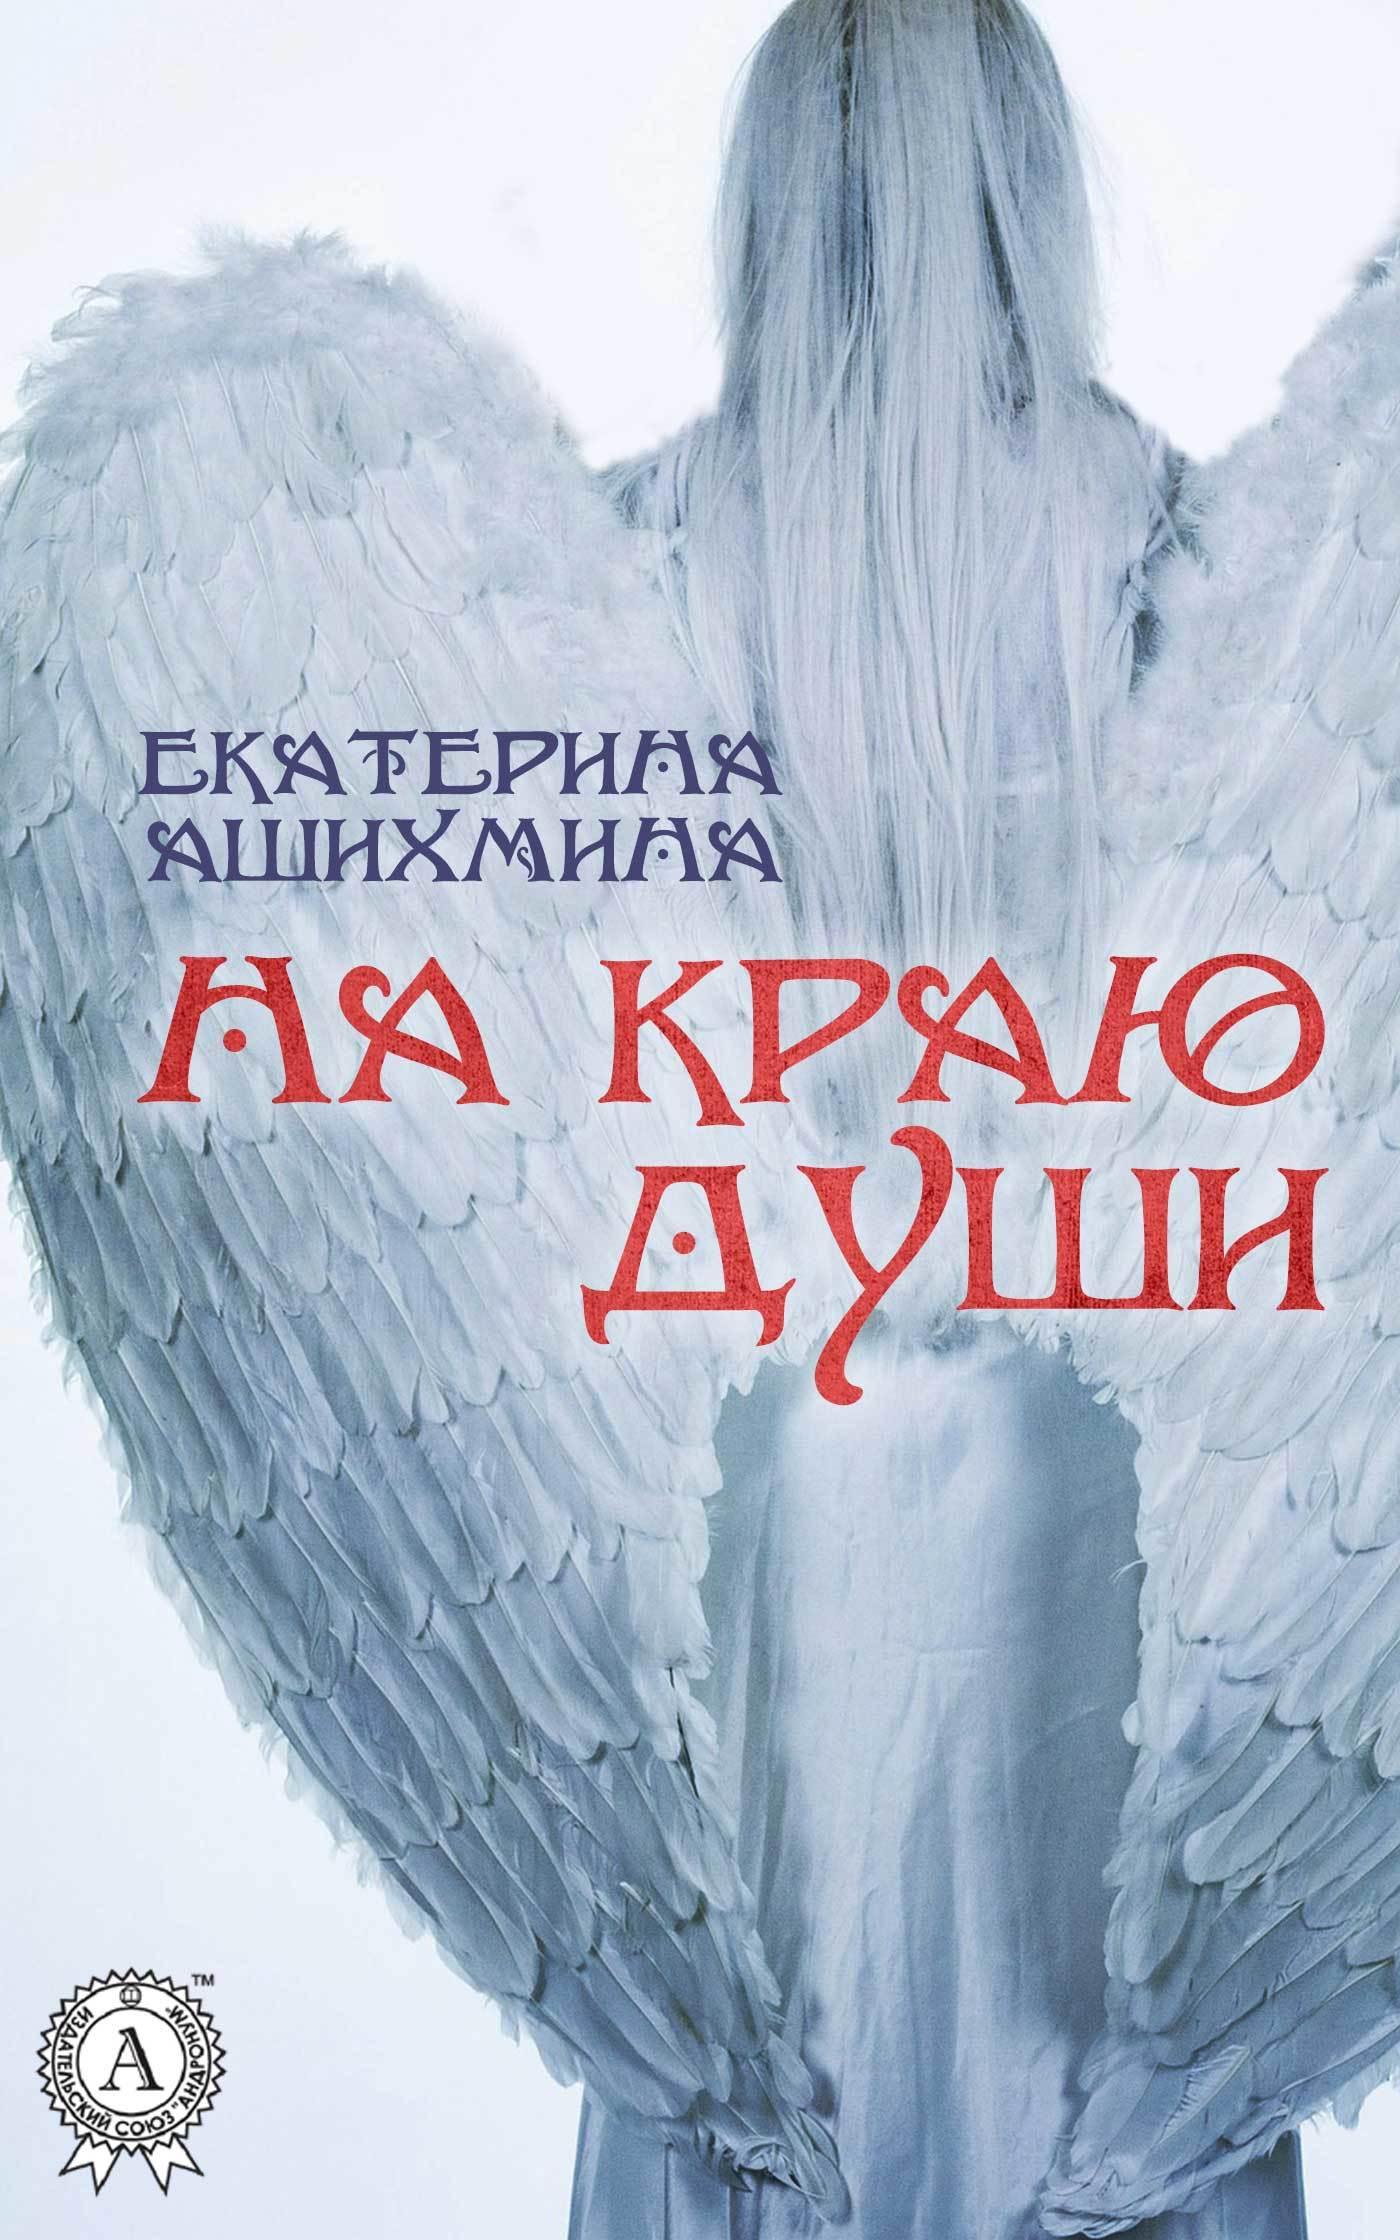 Екатерина Ашихмина На краю души artspace пенал косметичка artspace floral